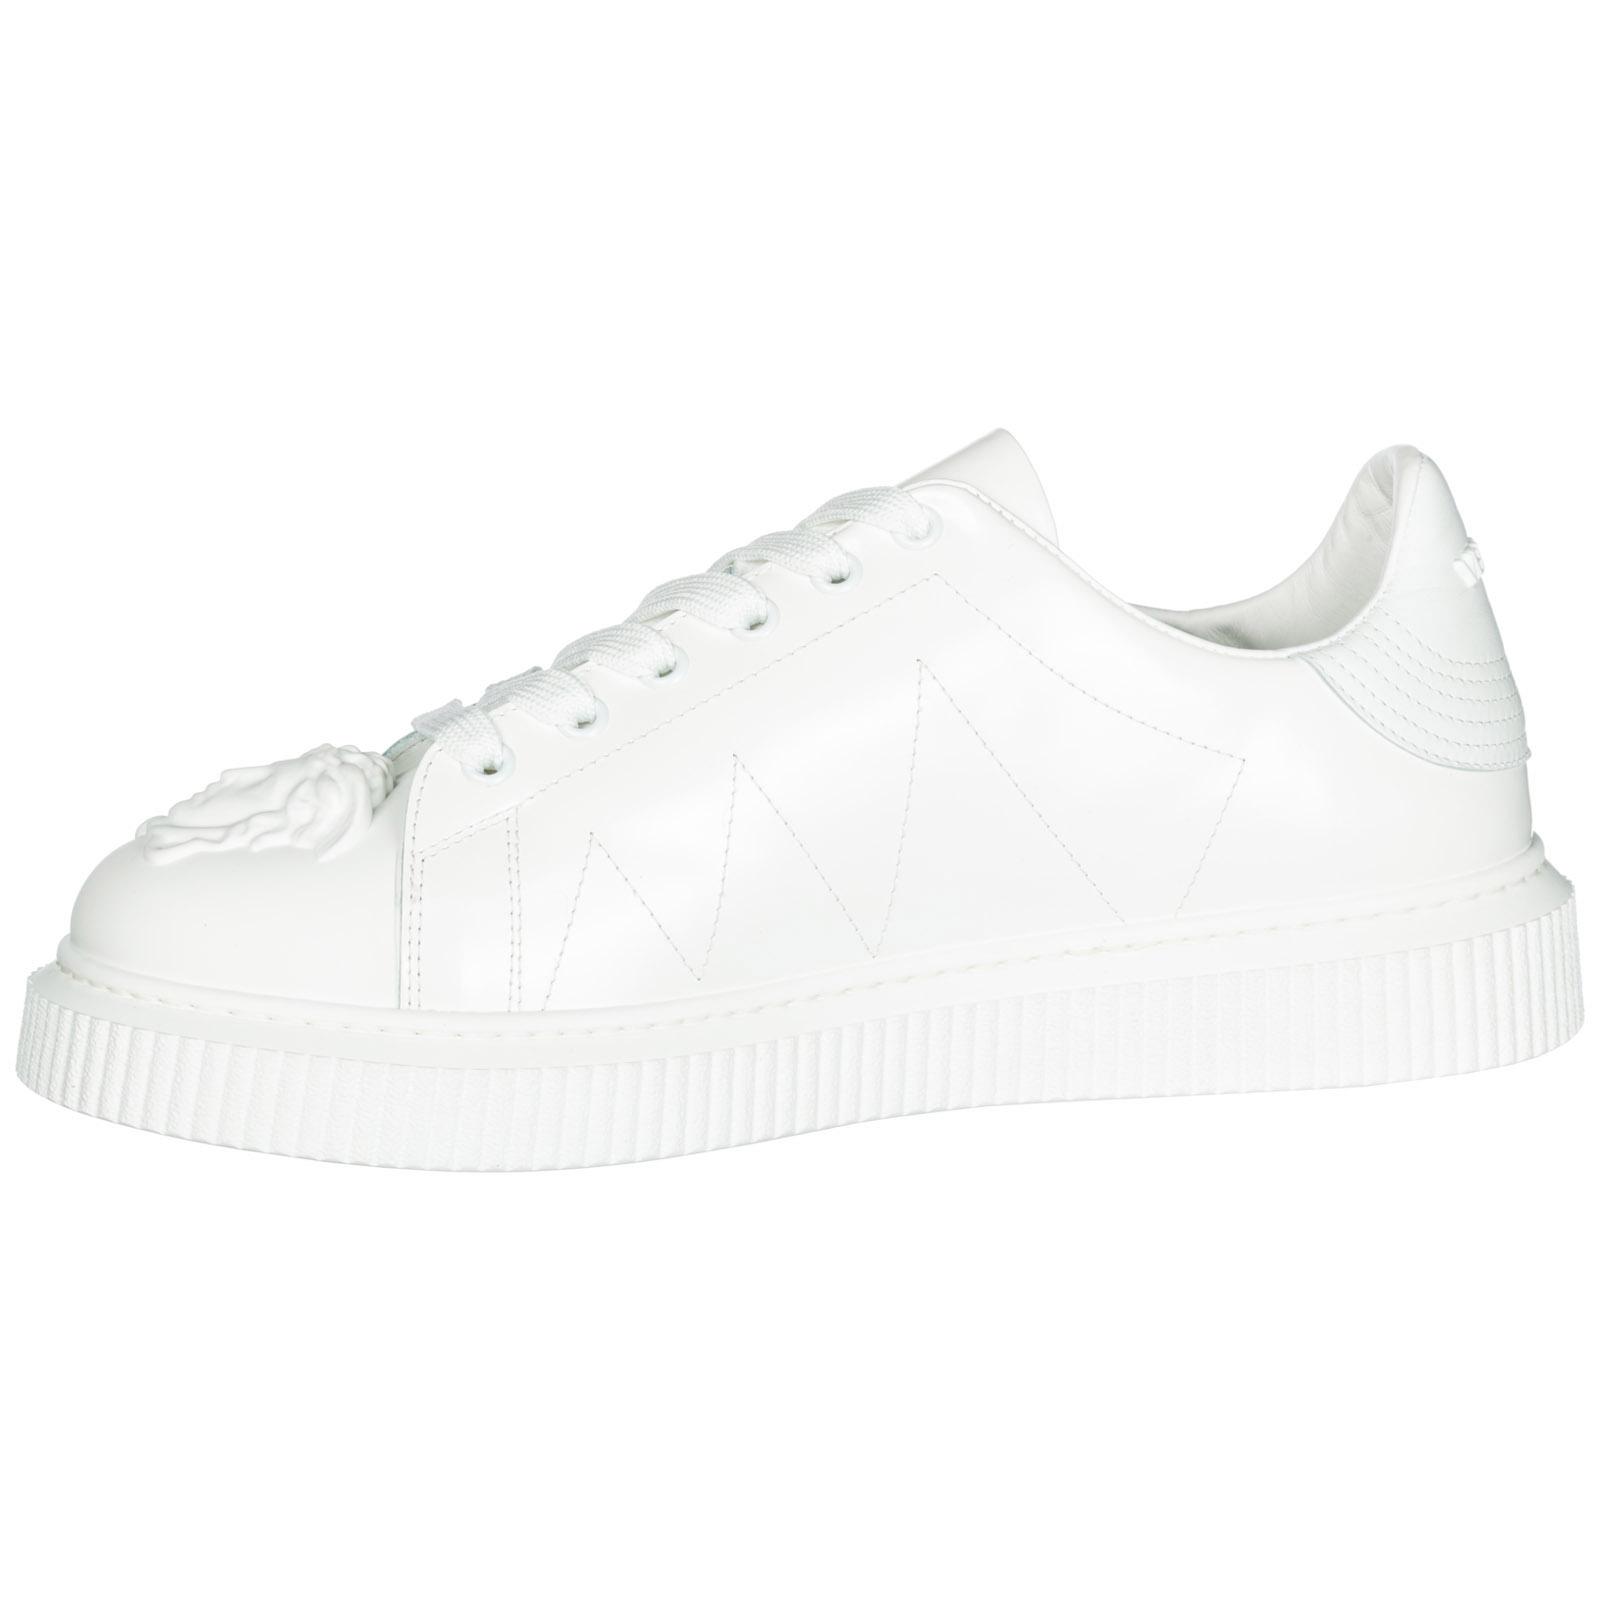 K0A DSU6987 Sneakers medusa bianco Versace DVTN5G Nyx qXvUfZwT